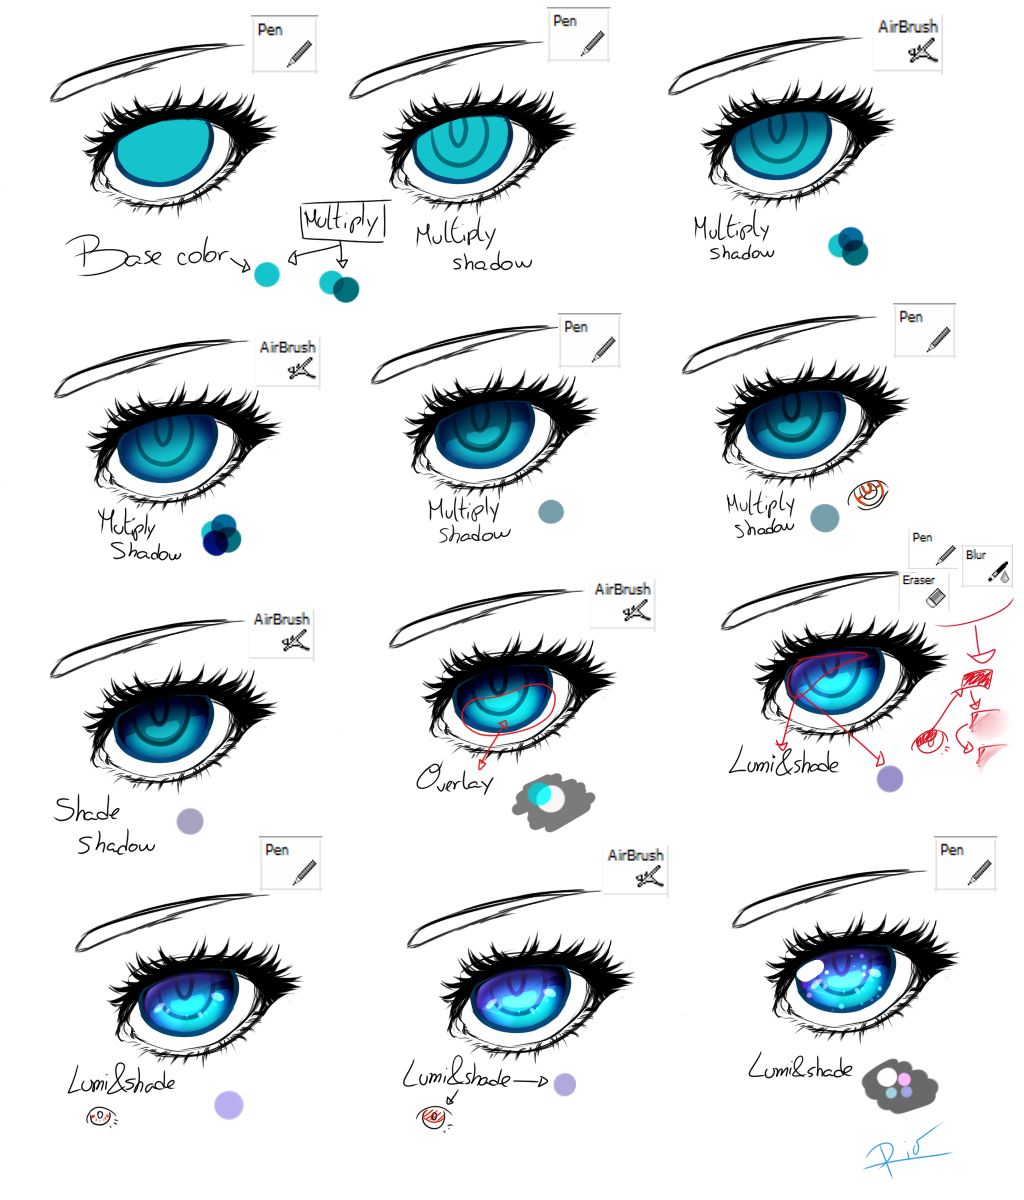 Easy eye colouring tutorial by shinjiiru on deviantart blue eye tutorial by jennacaminschi ccuart Gallery